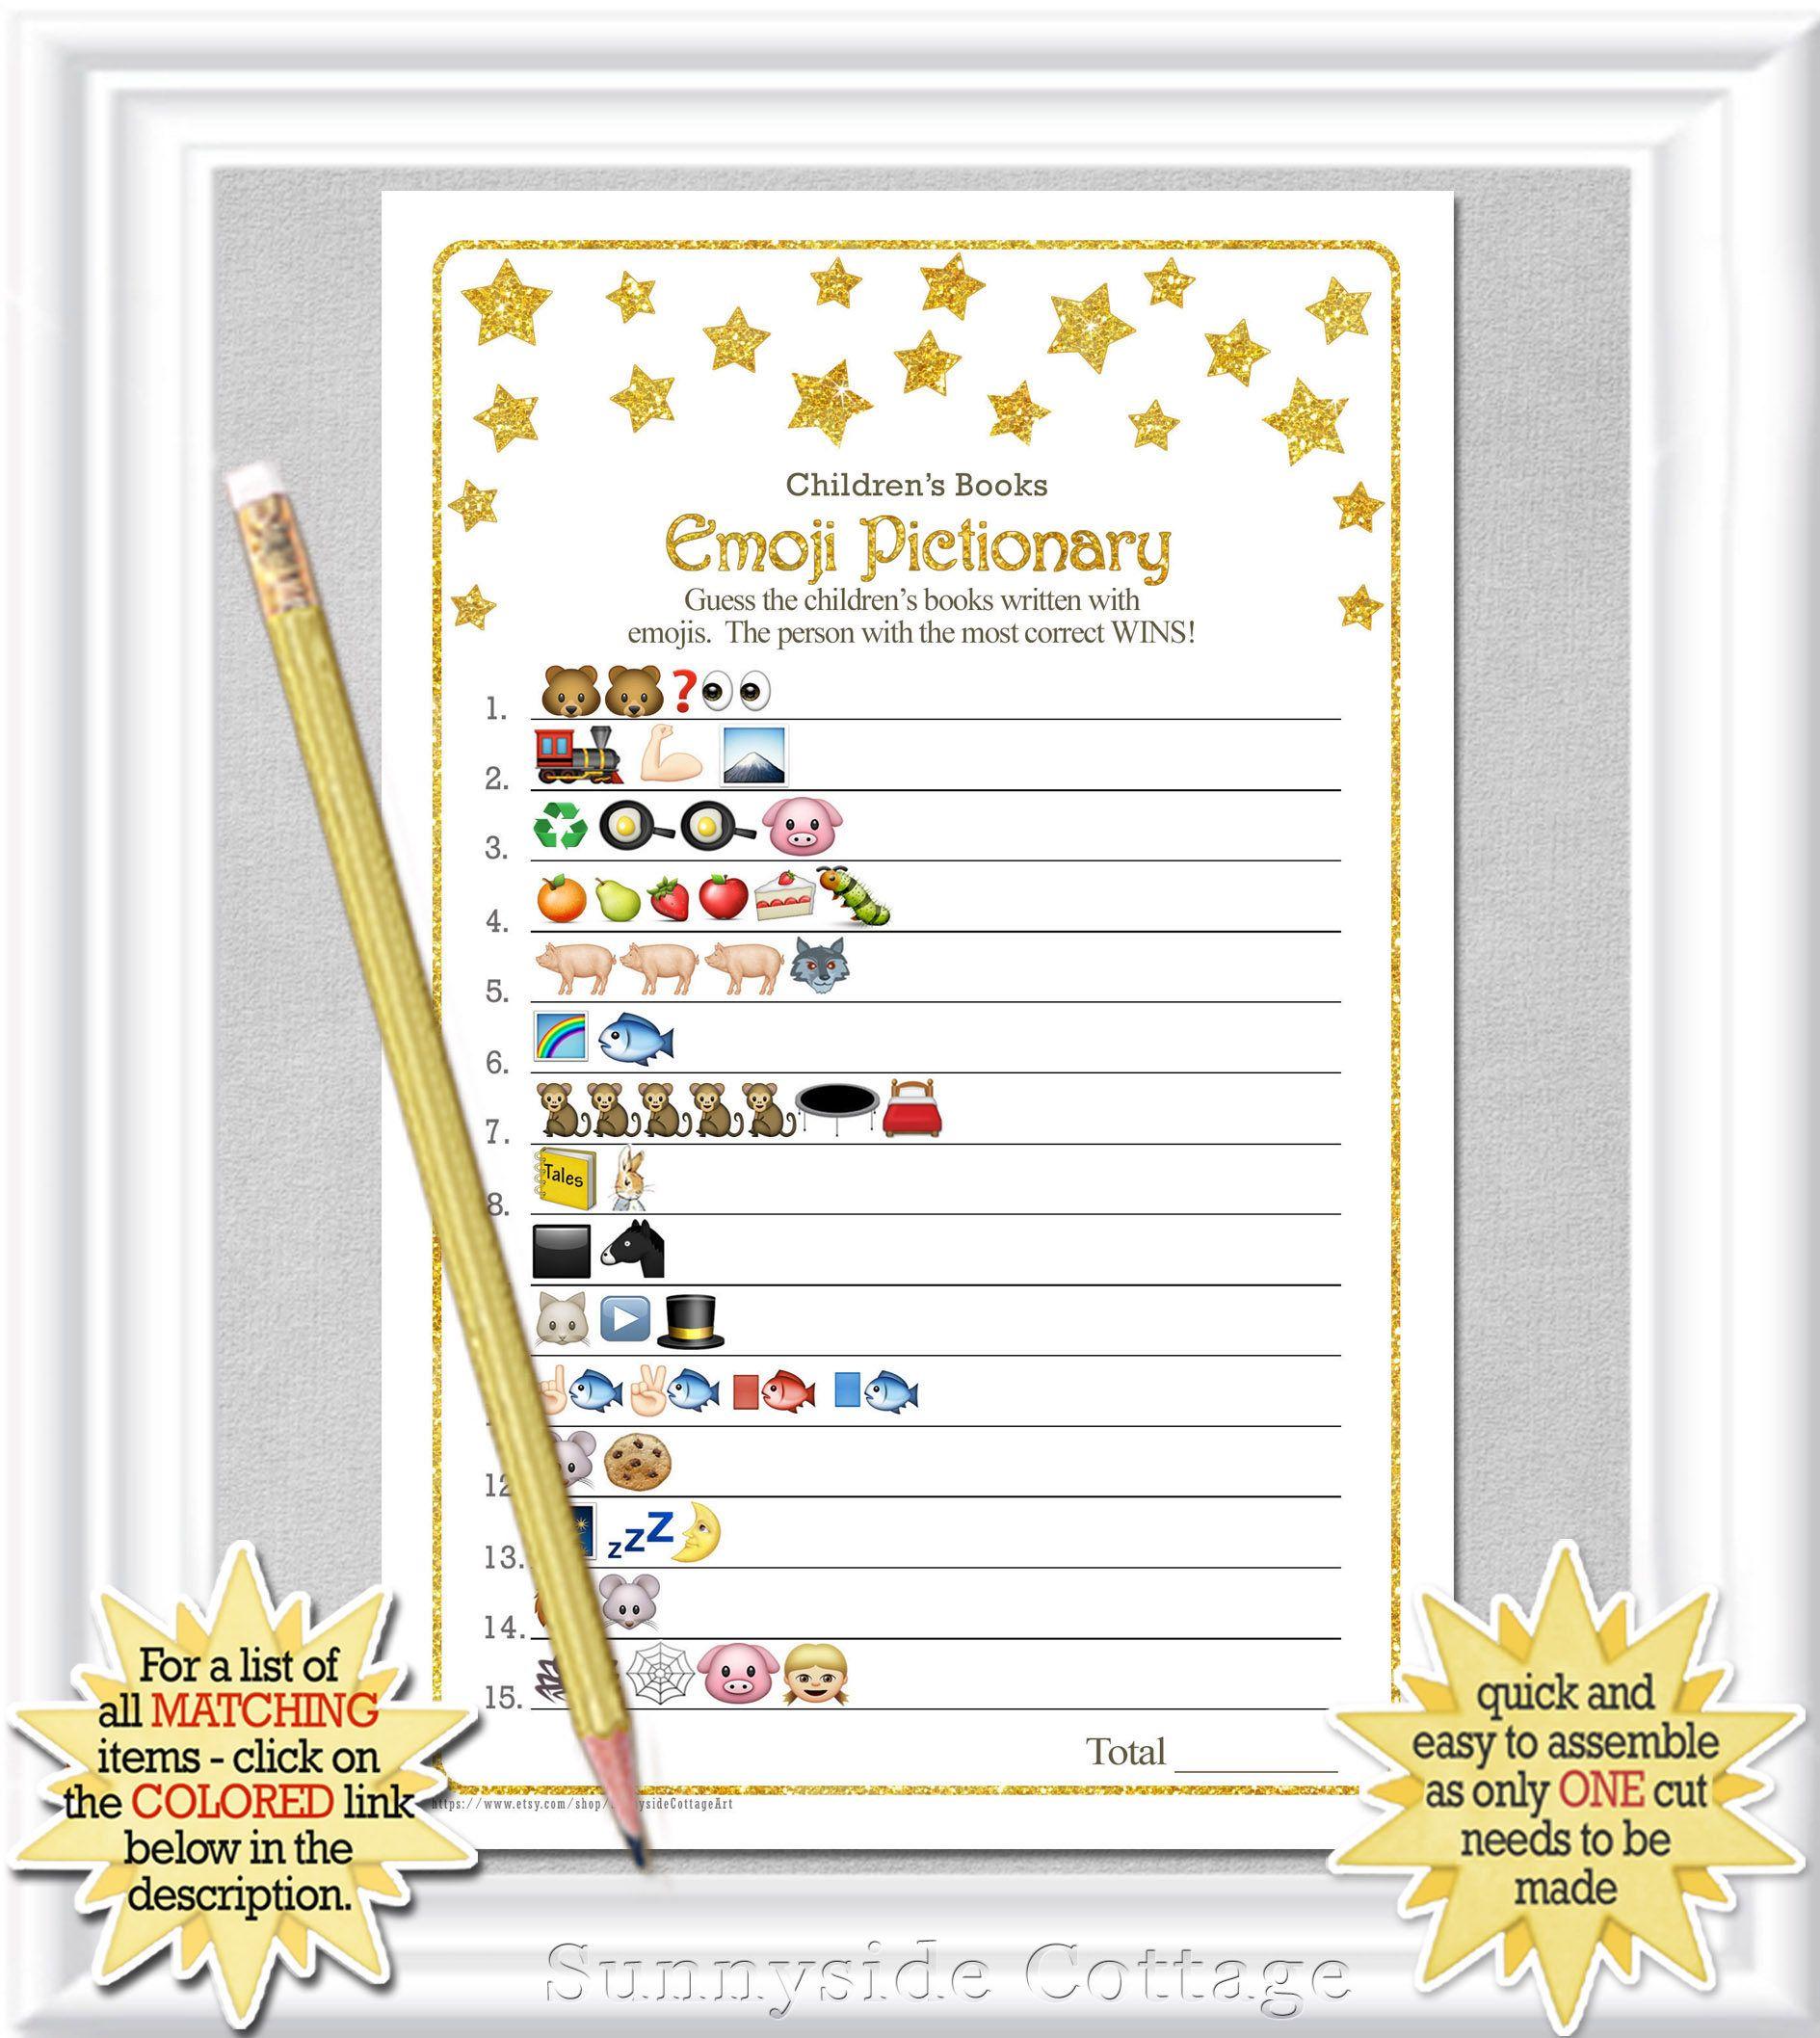 Childrens Books Emoji Pictionary Game Baby Shower Game